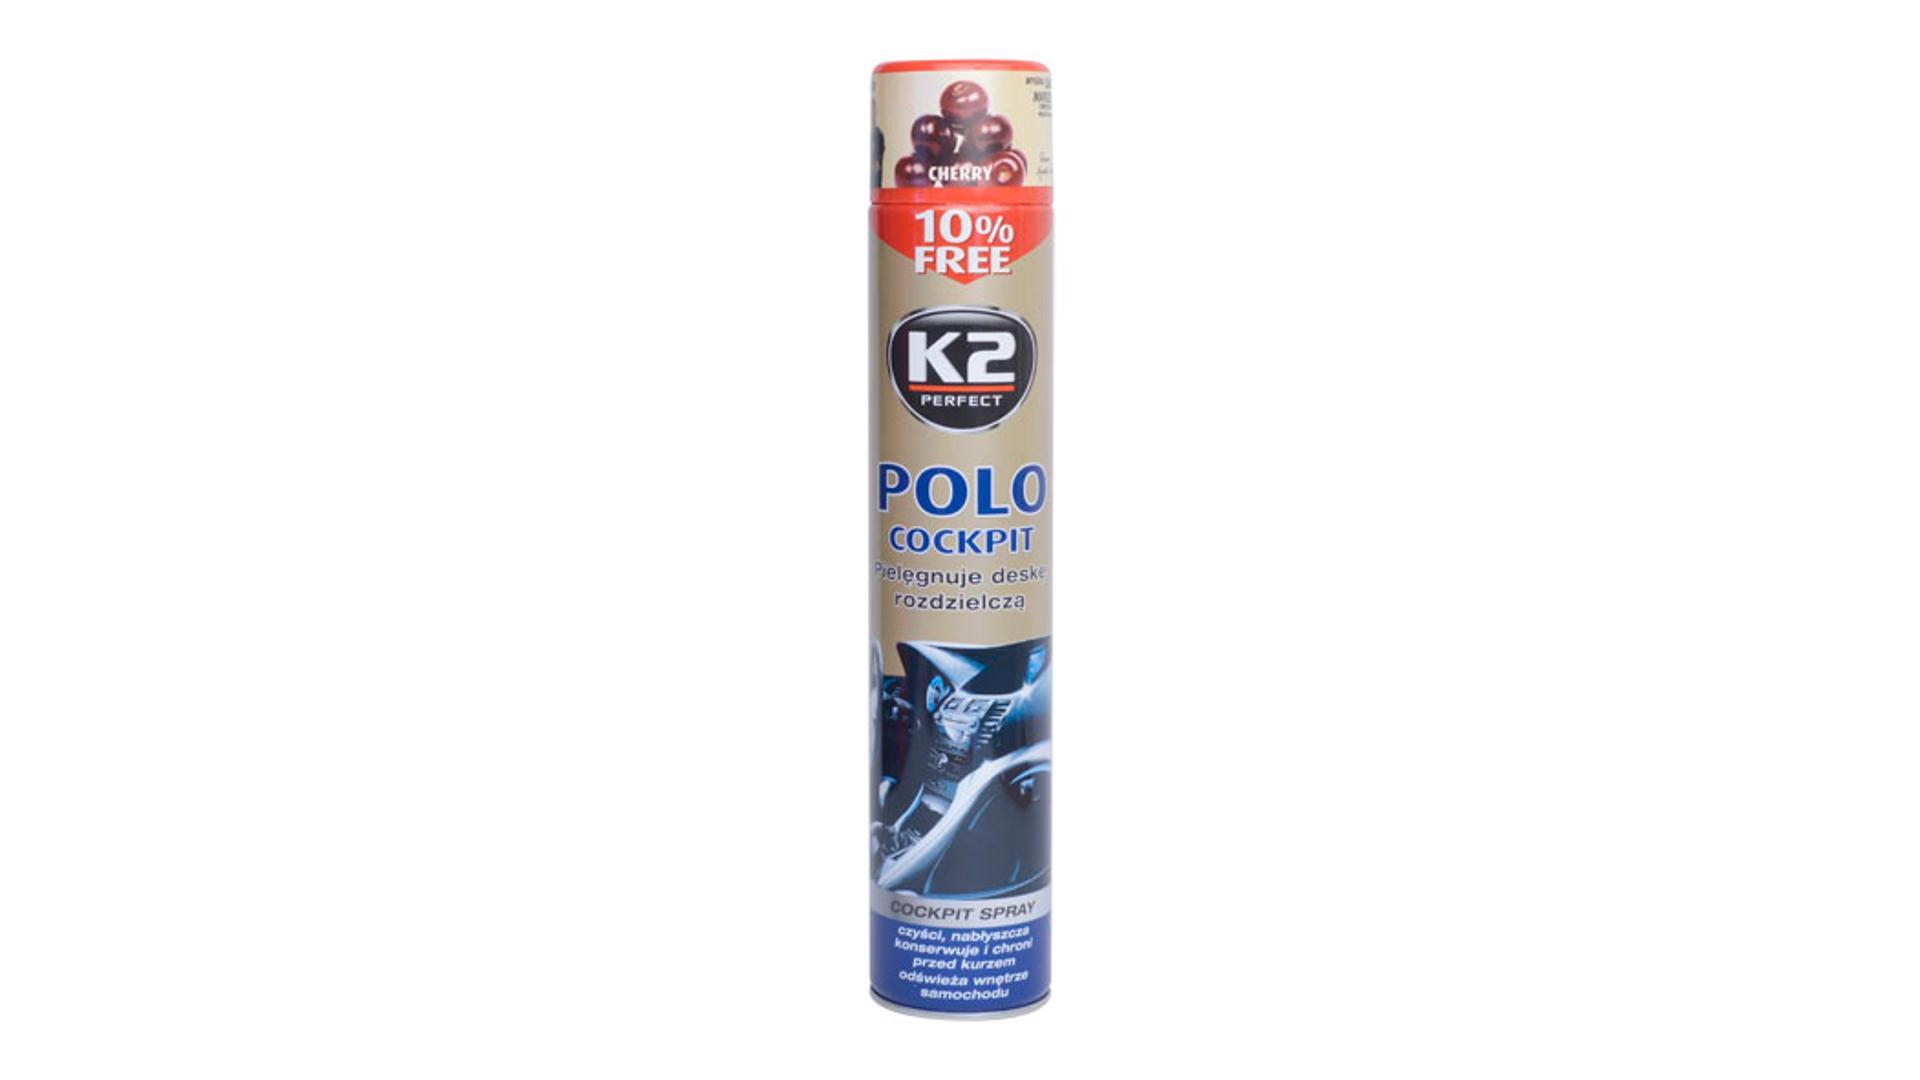 K2 POLO COCKPIT 750ml CHERRY - ochrana vnitřních plastů